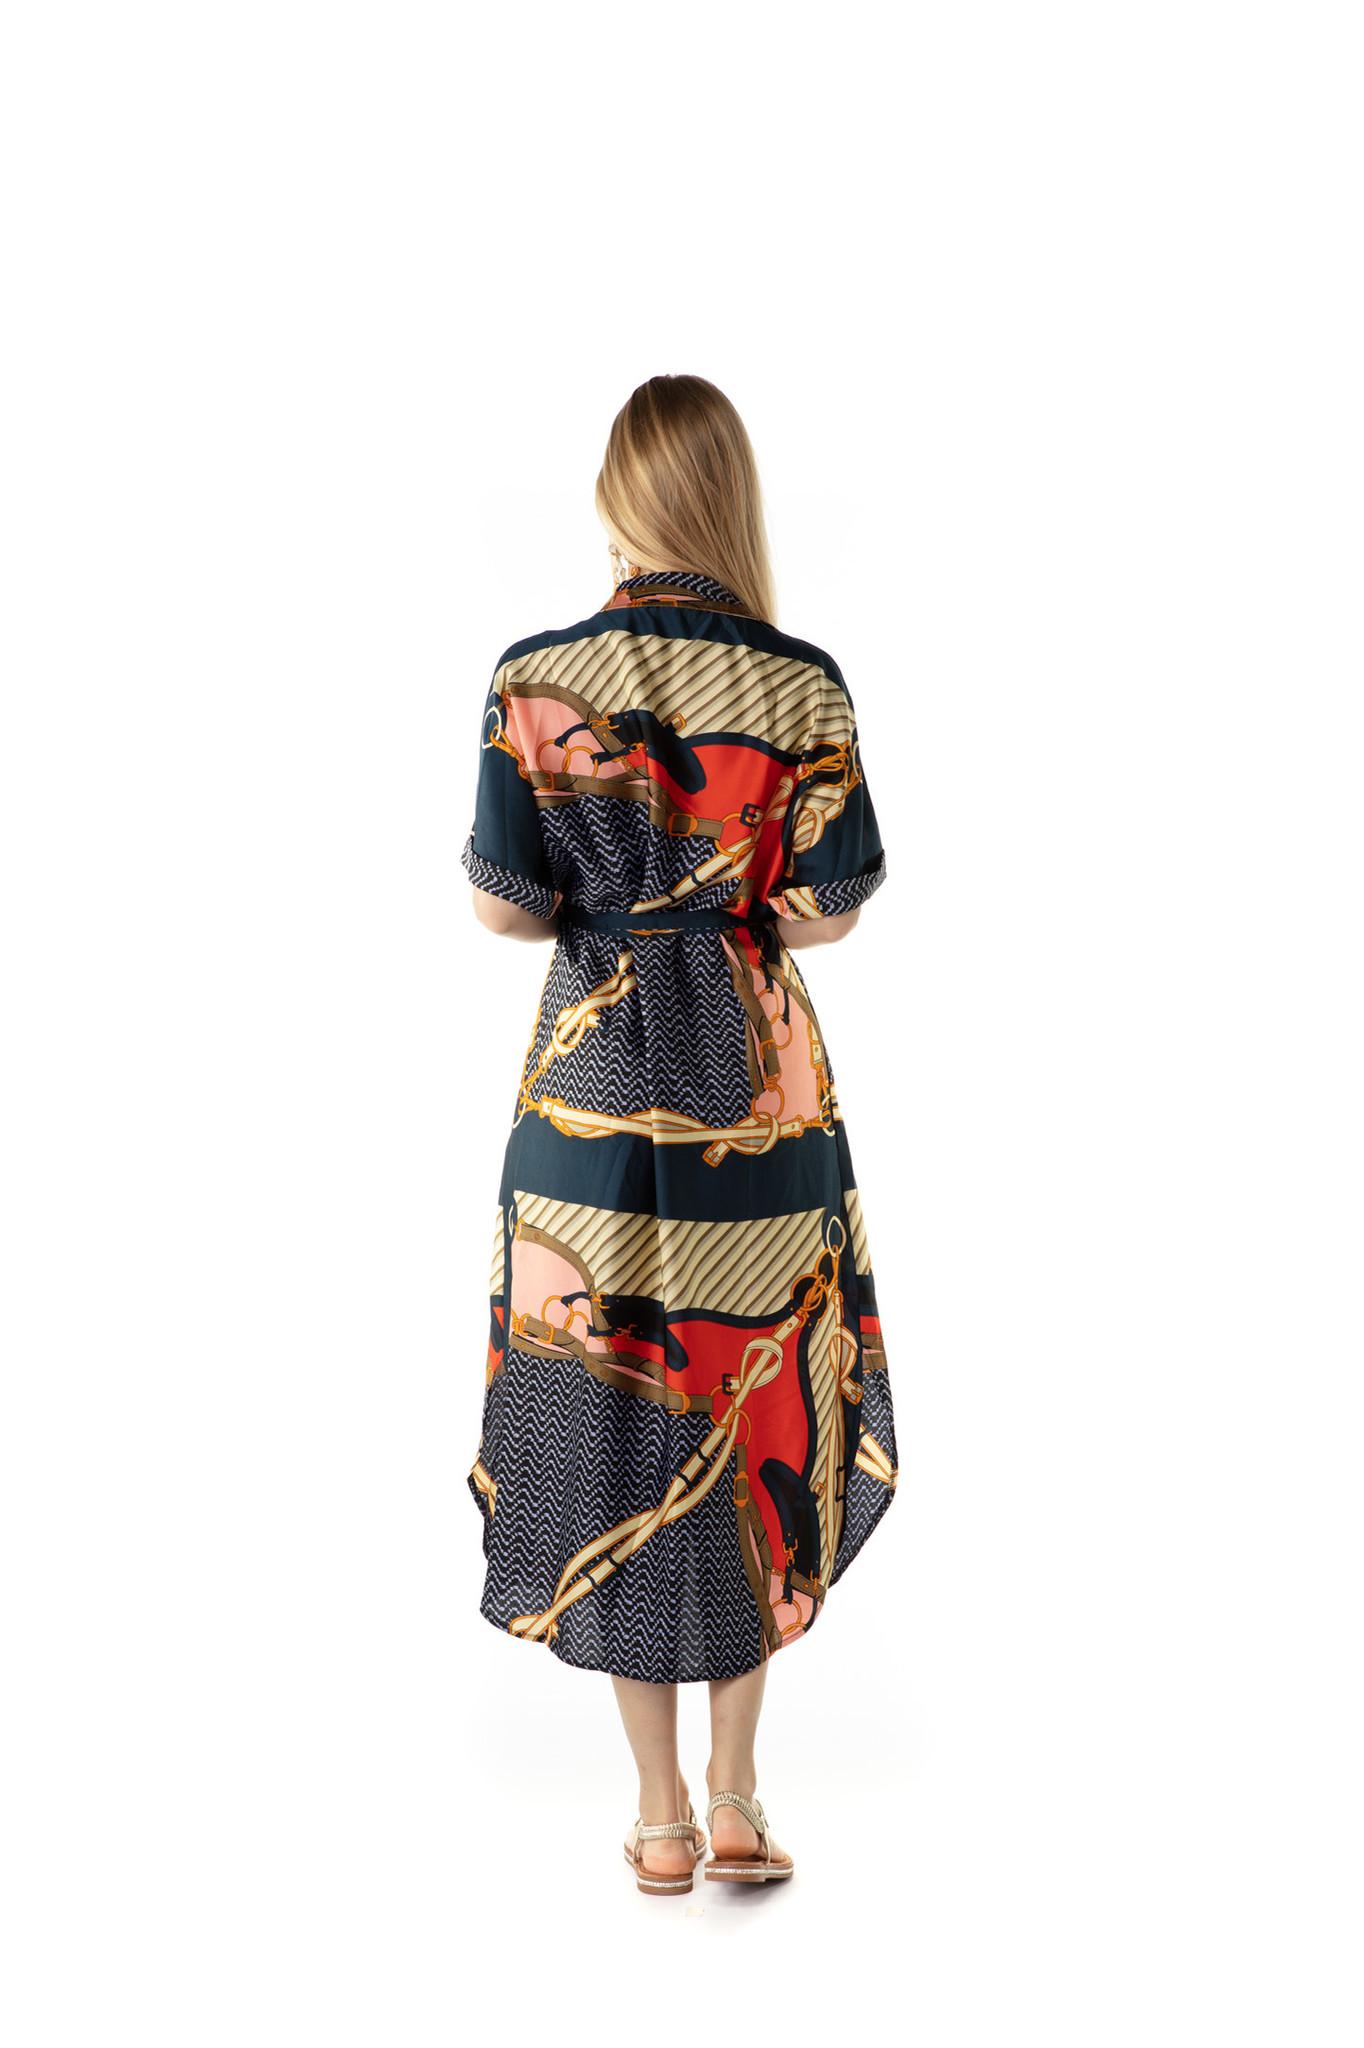 200ROB0171 Hemd jurk maxi hermes-print Donker blauw